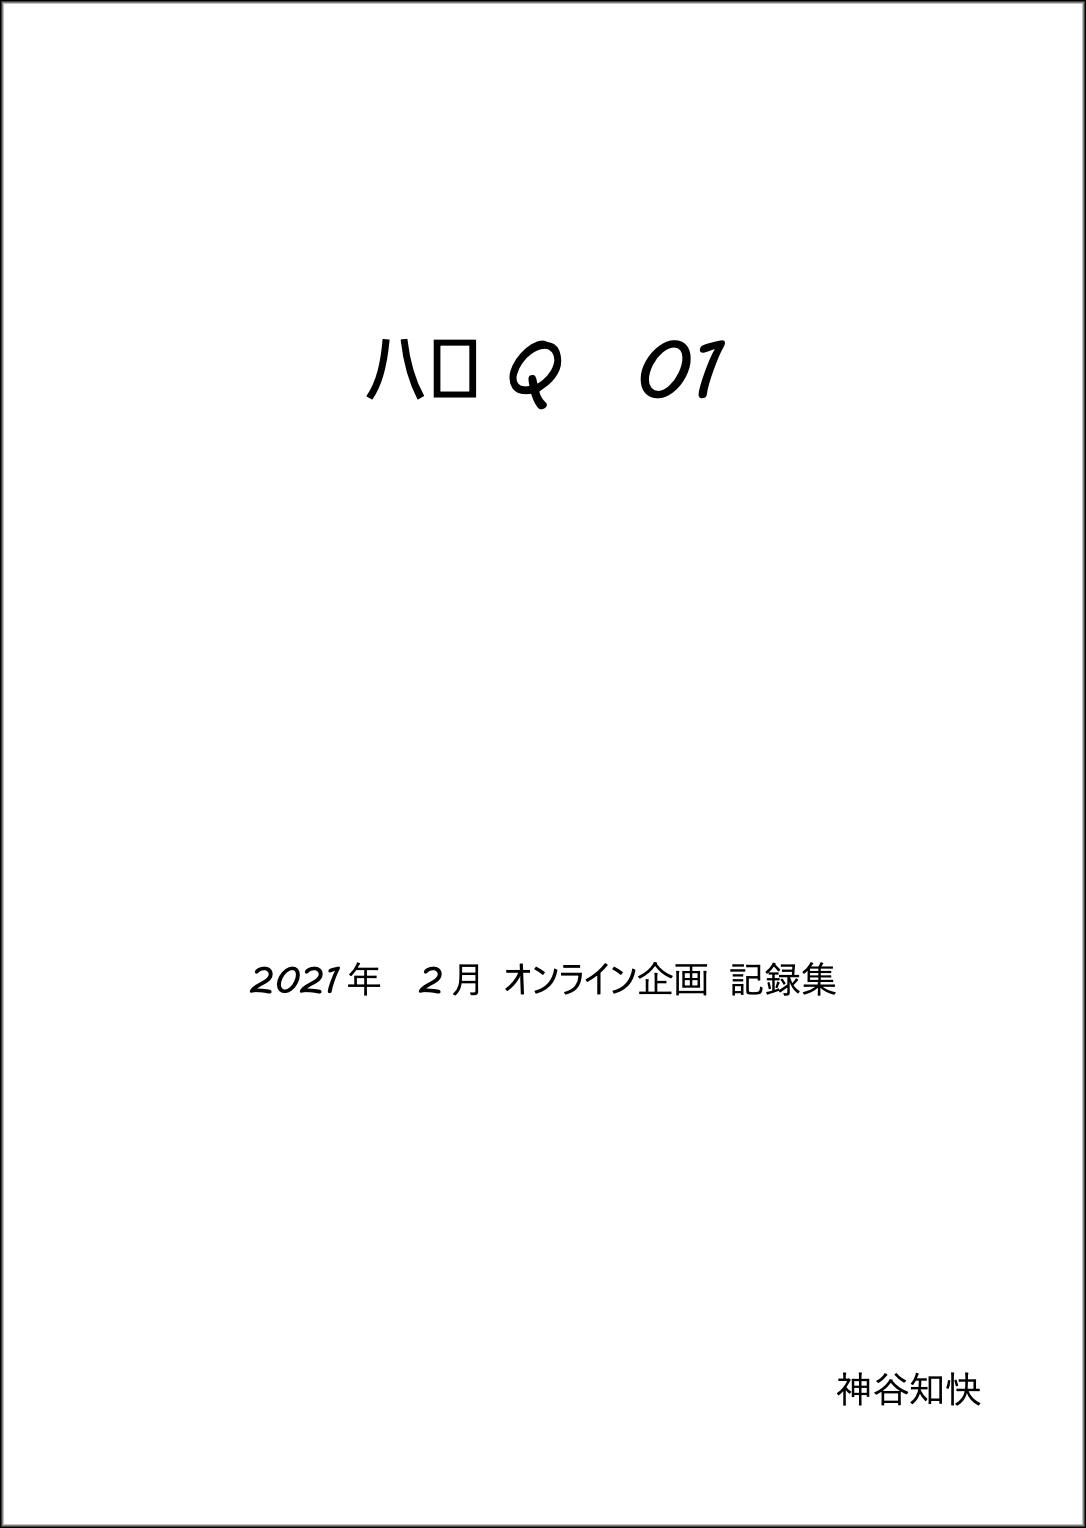 C33161950